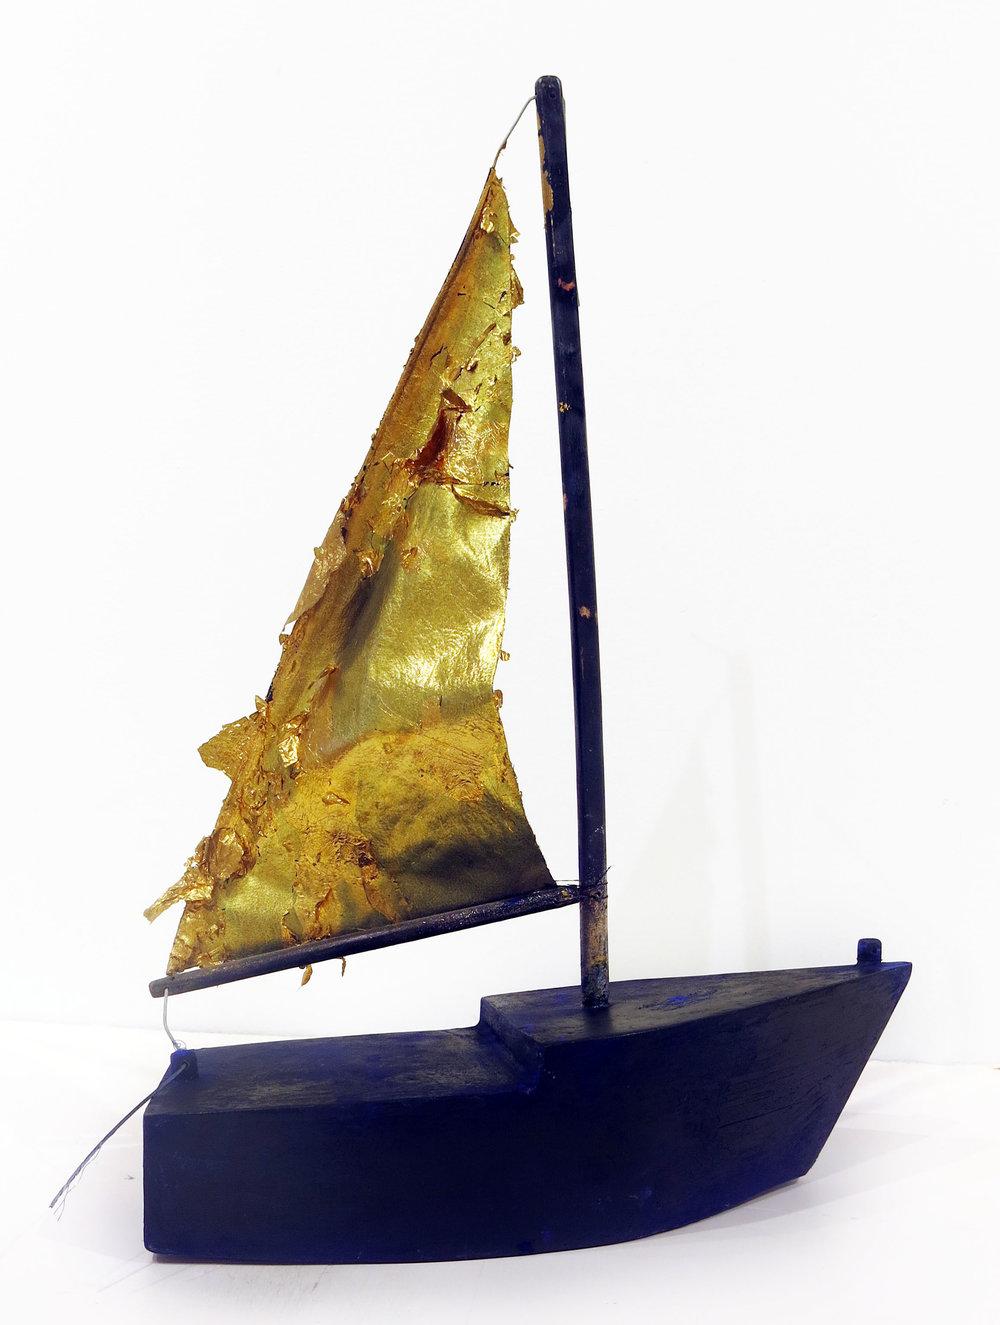 Herbert Reichert,  Untitled (sailboat),  2015, oil, wood glue, foamcore, pastel, wood, leather, gold leaf, 20.5h x 14w x 6.5d in.